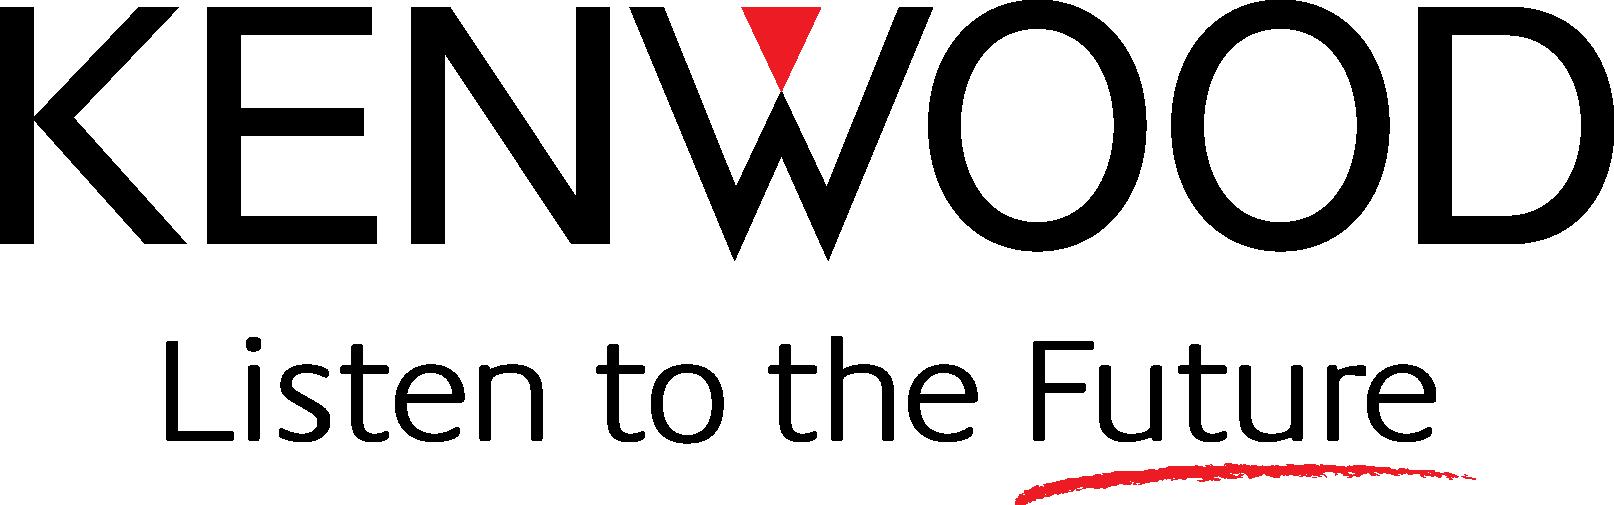 Kenwood-logo_vector